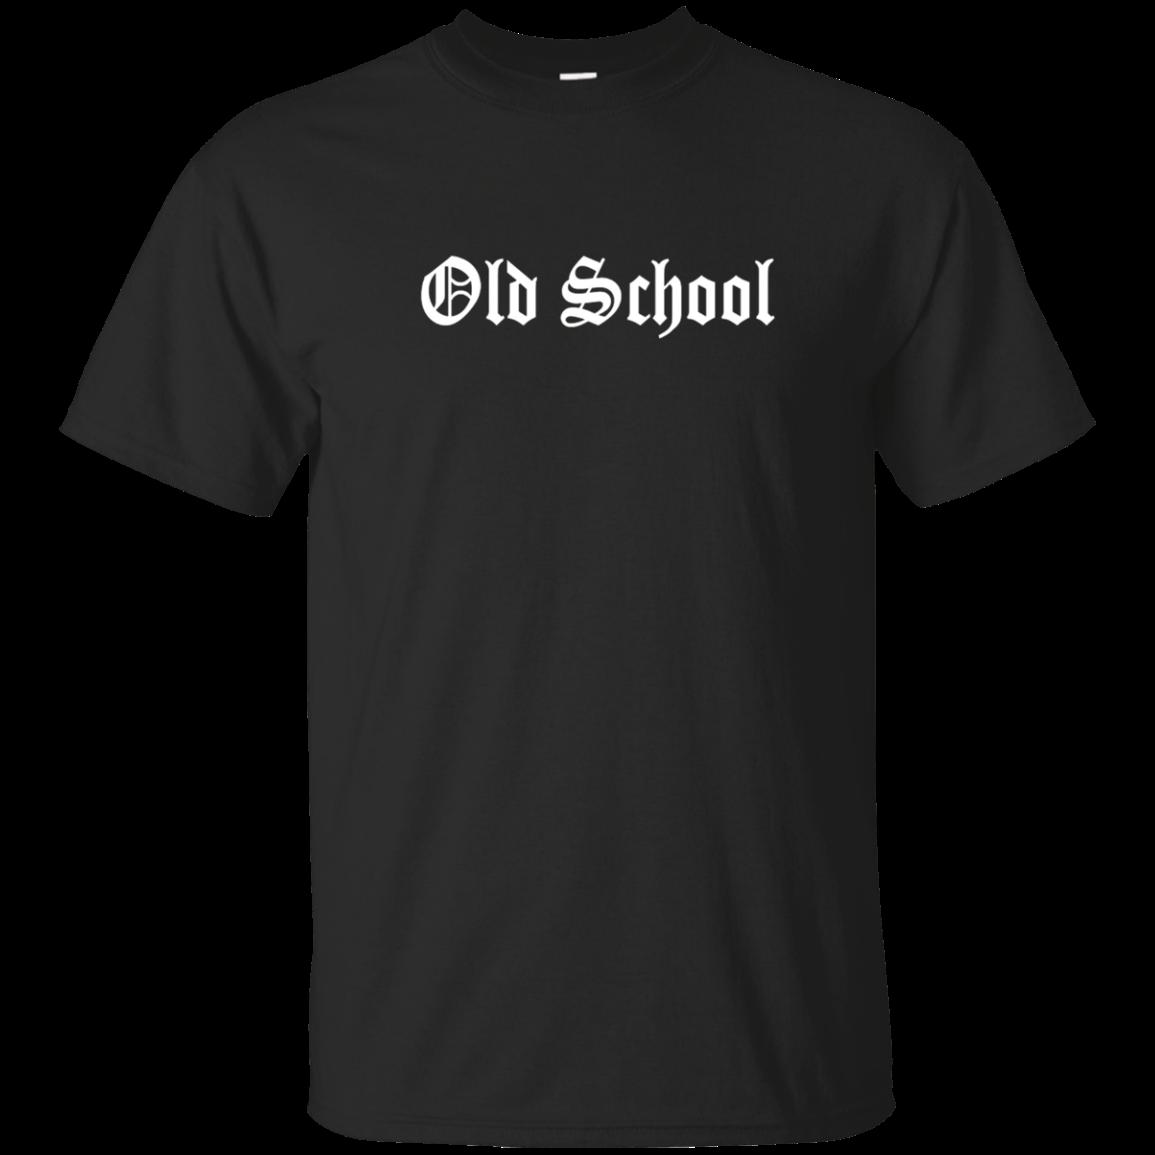 Old School Shirt Font